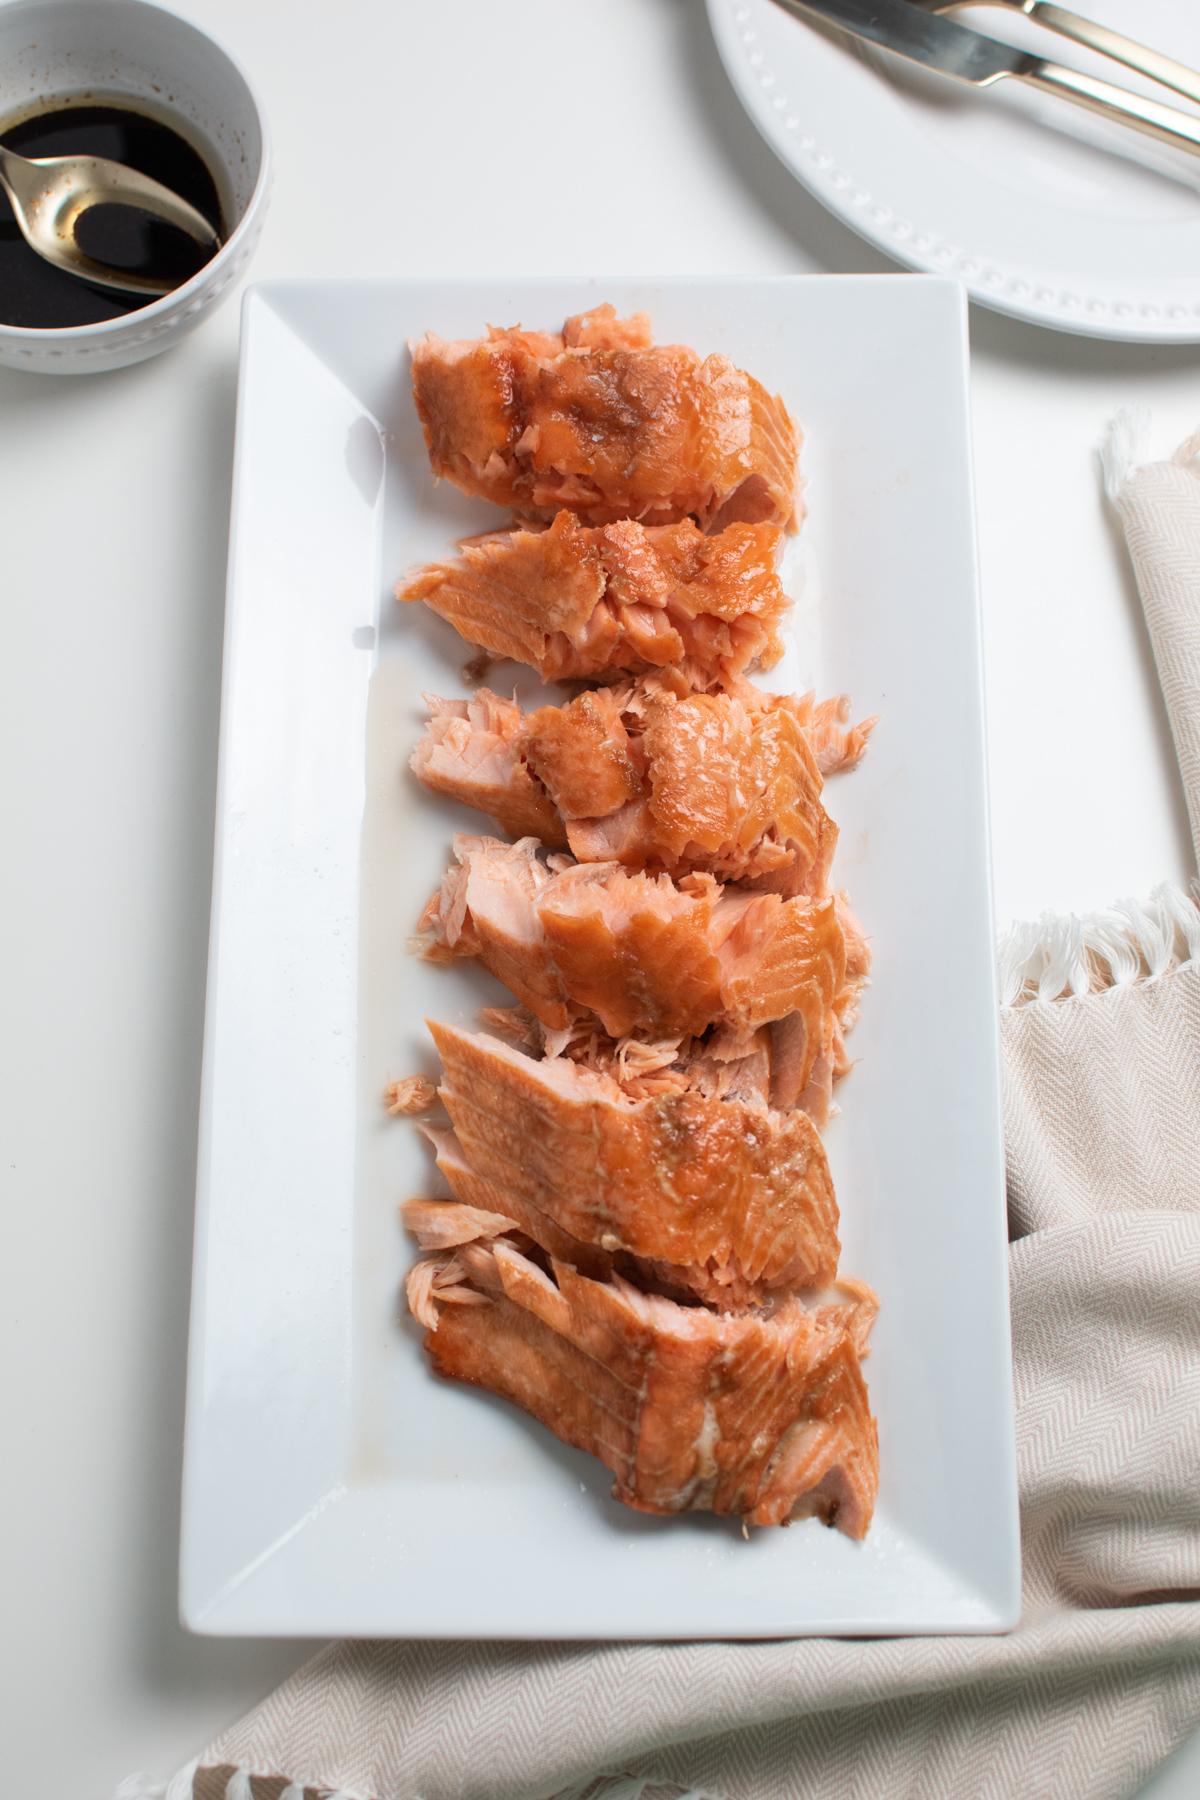 Brown sugar glazed salmon on a serving platter.